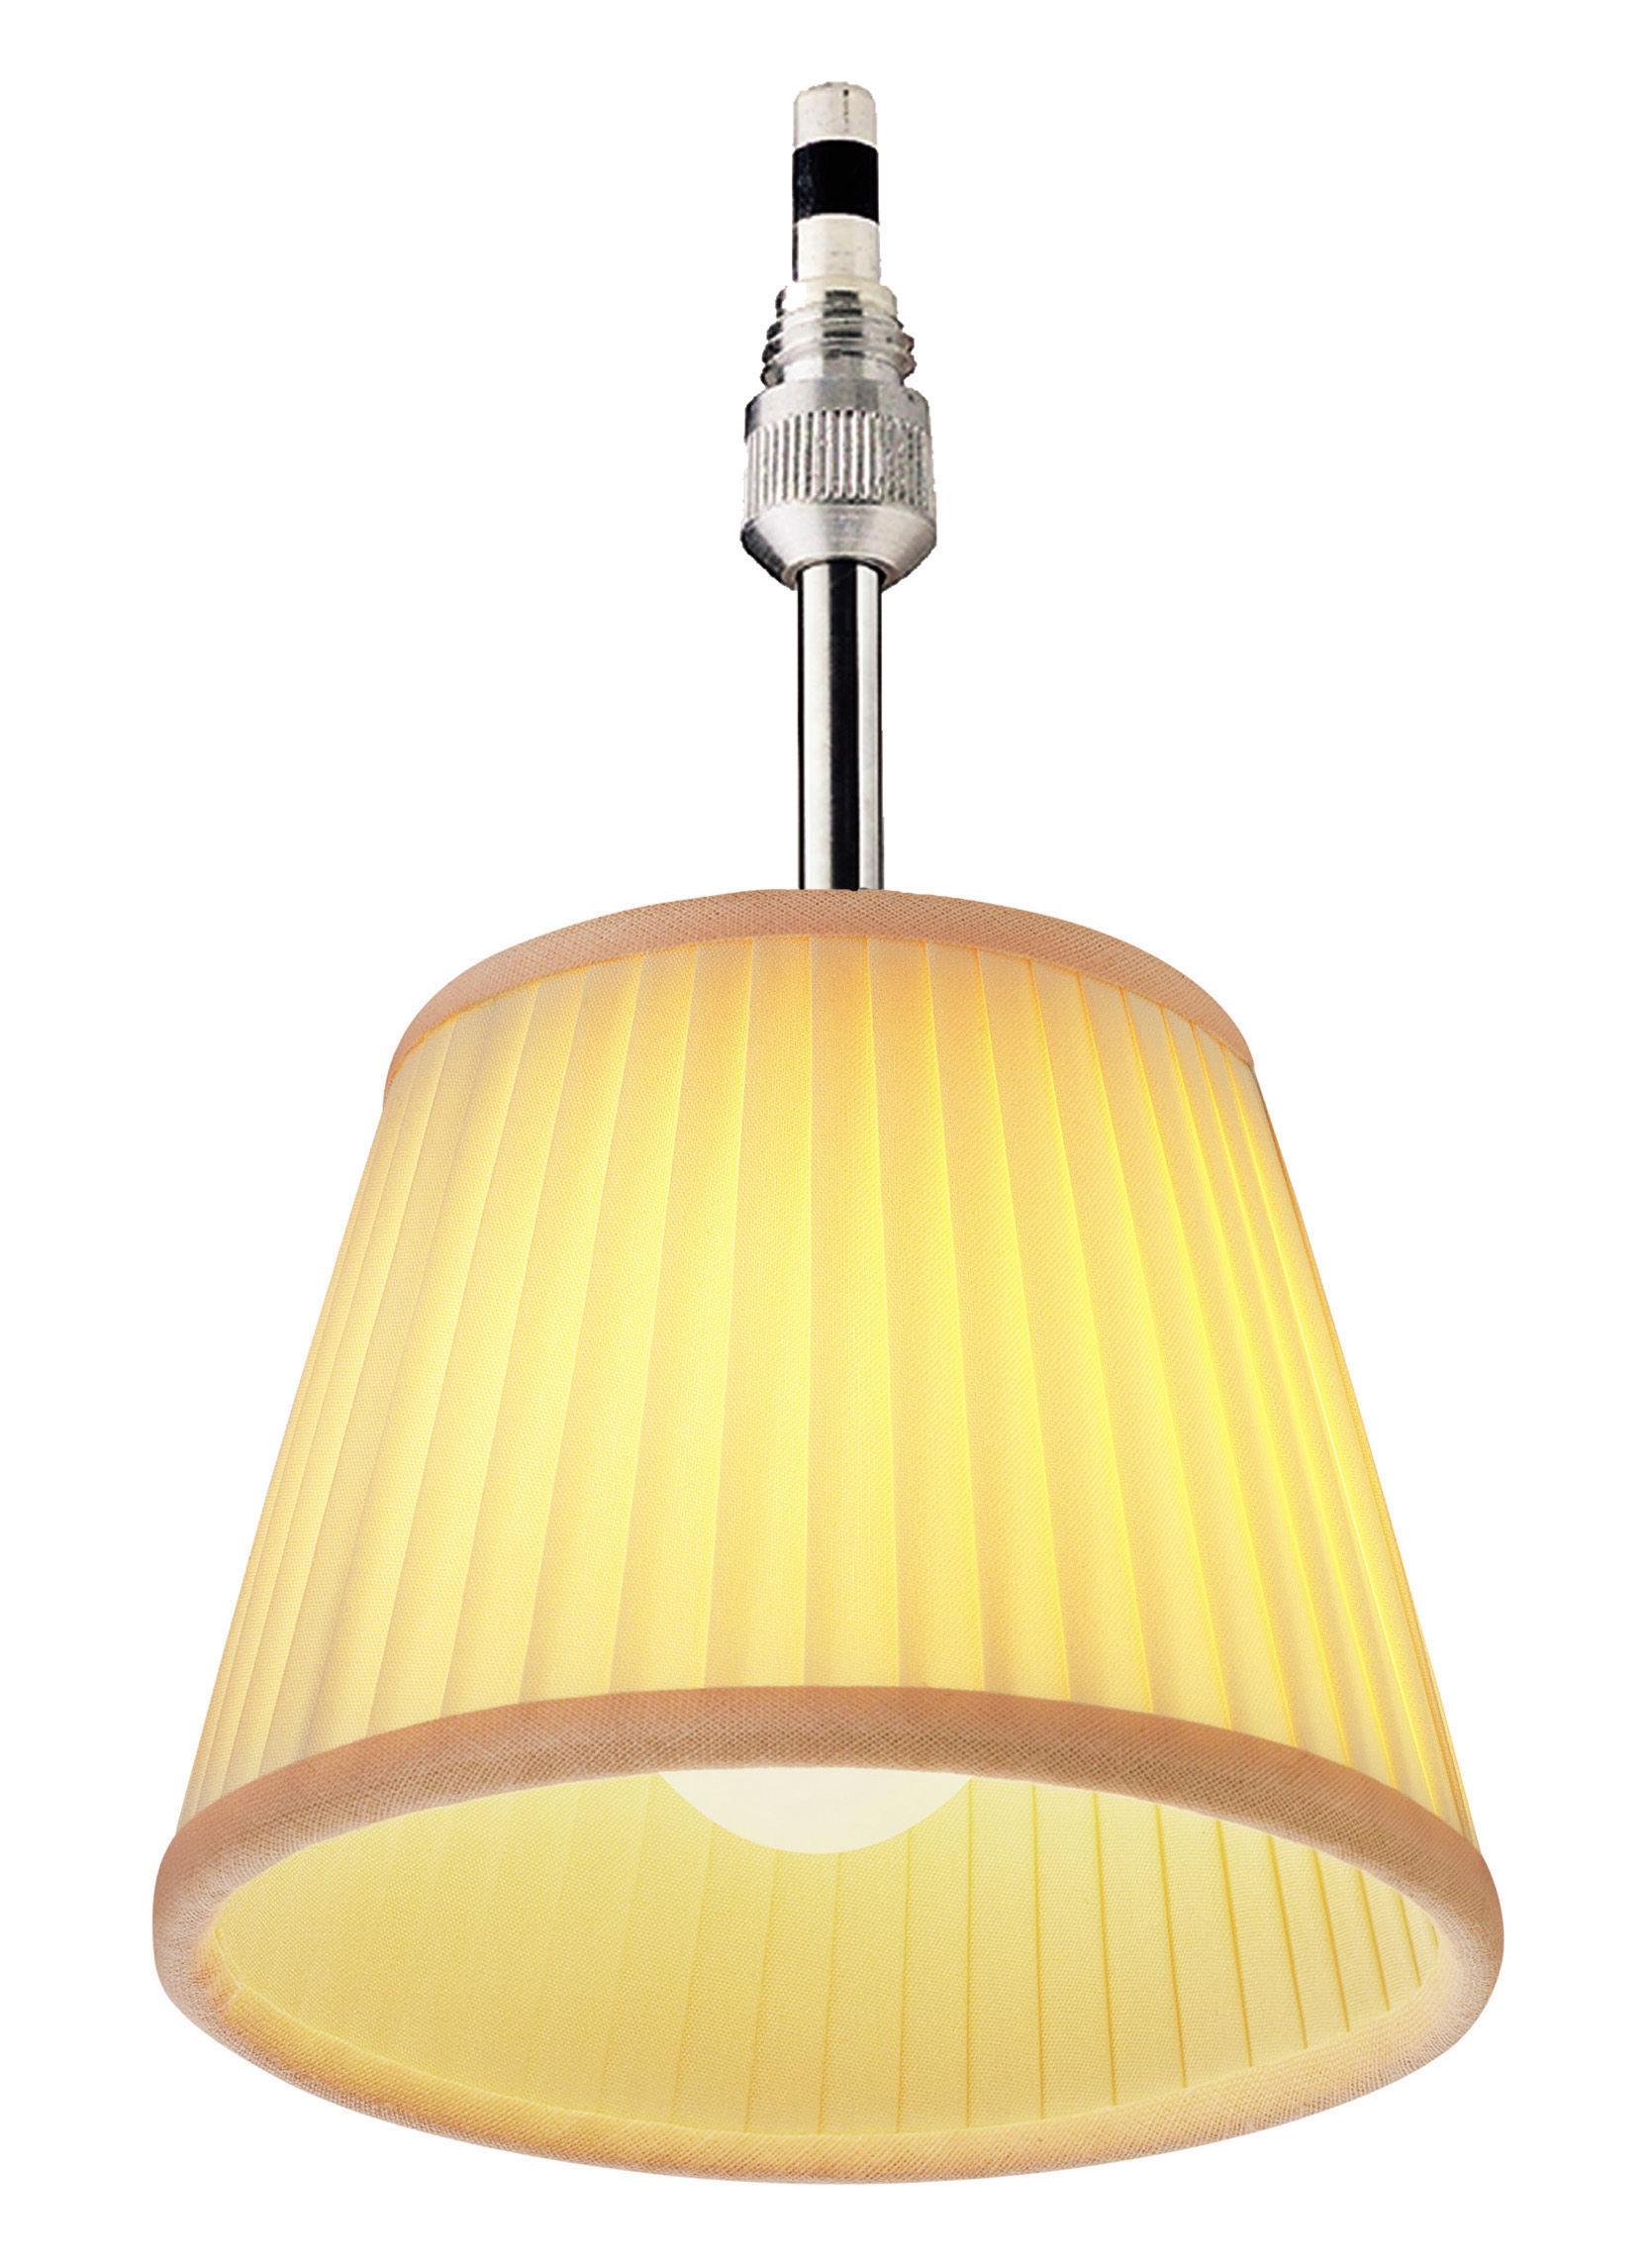 Luminaire - Suspensions - Suspension Romeo Babe Soft Ø 11cm / Version tissu - Flos - Tissu / Ivoire - Tissu